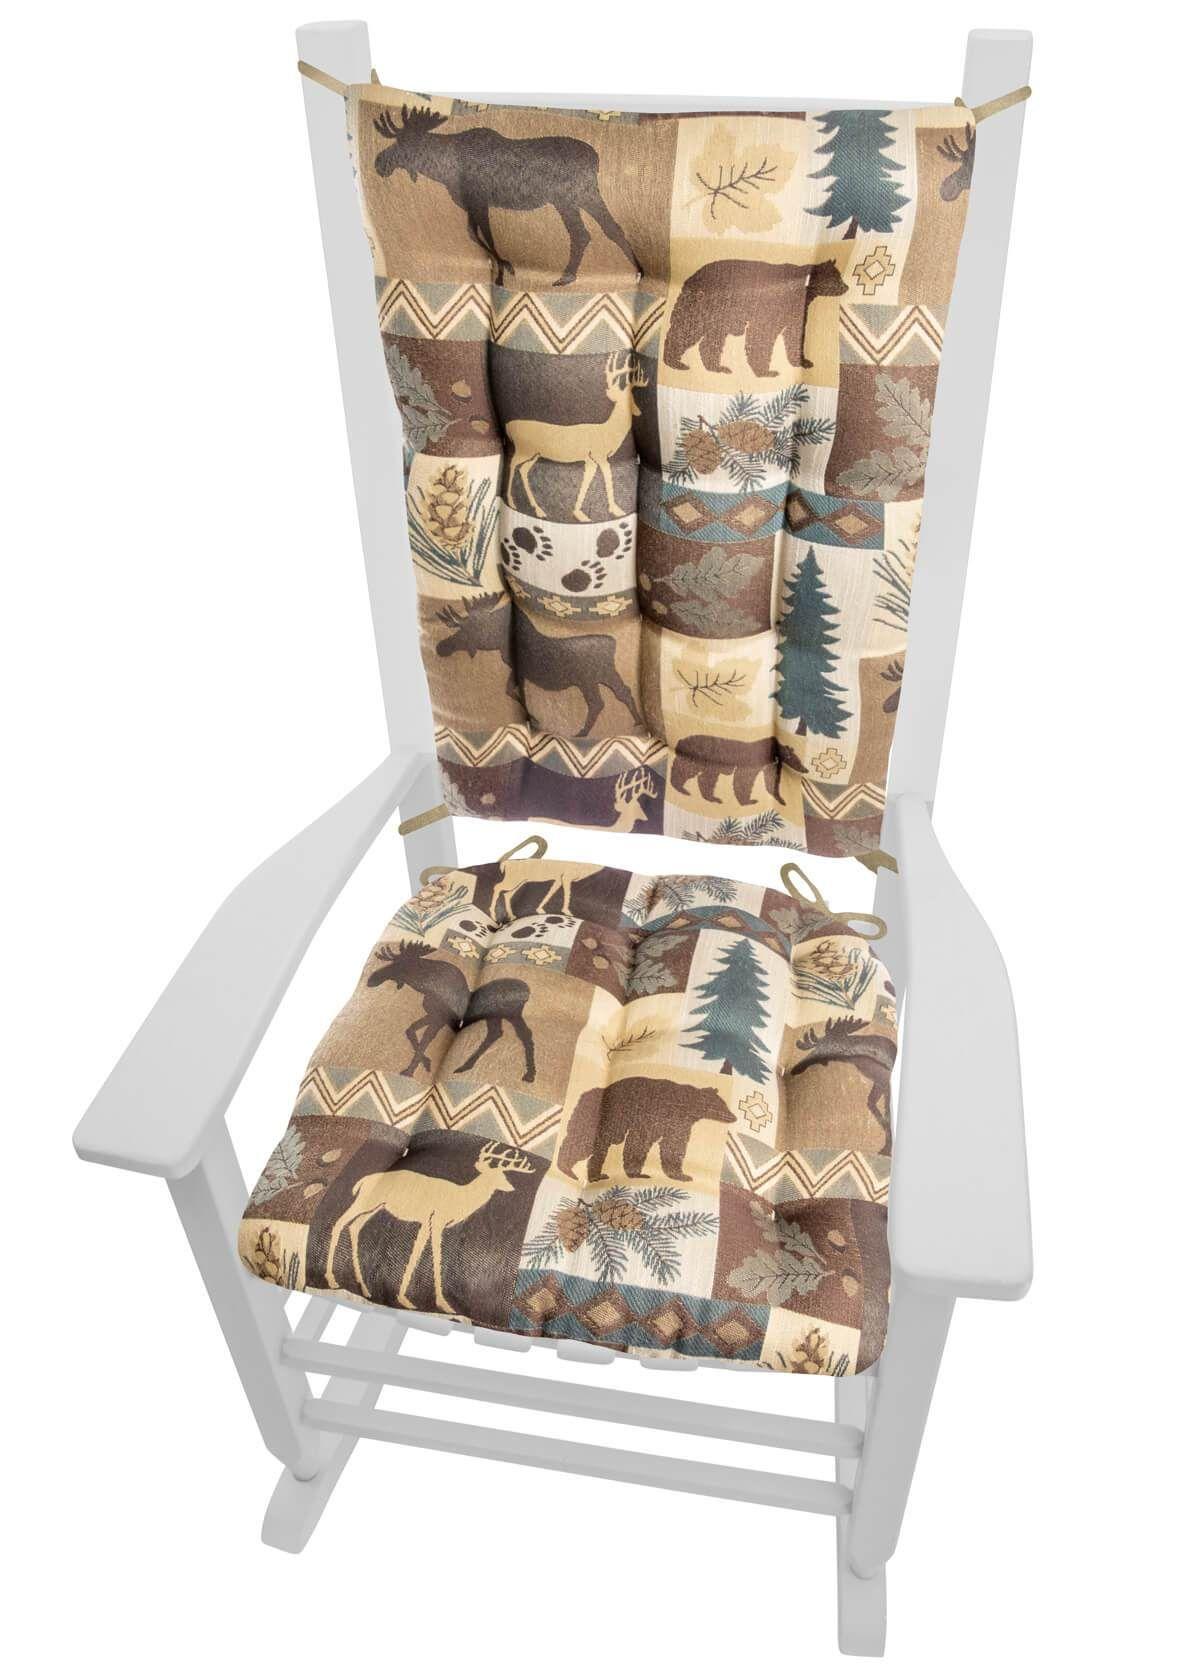 Prime Wilderness Summit Lake Rocking Chair Cushions Latex Foam Uwap Interior Chair Design Uwaporg